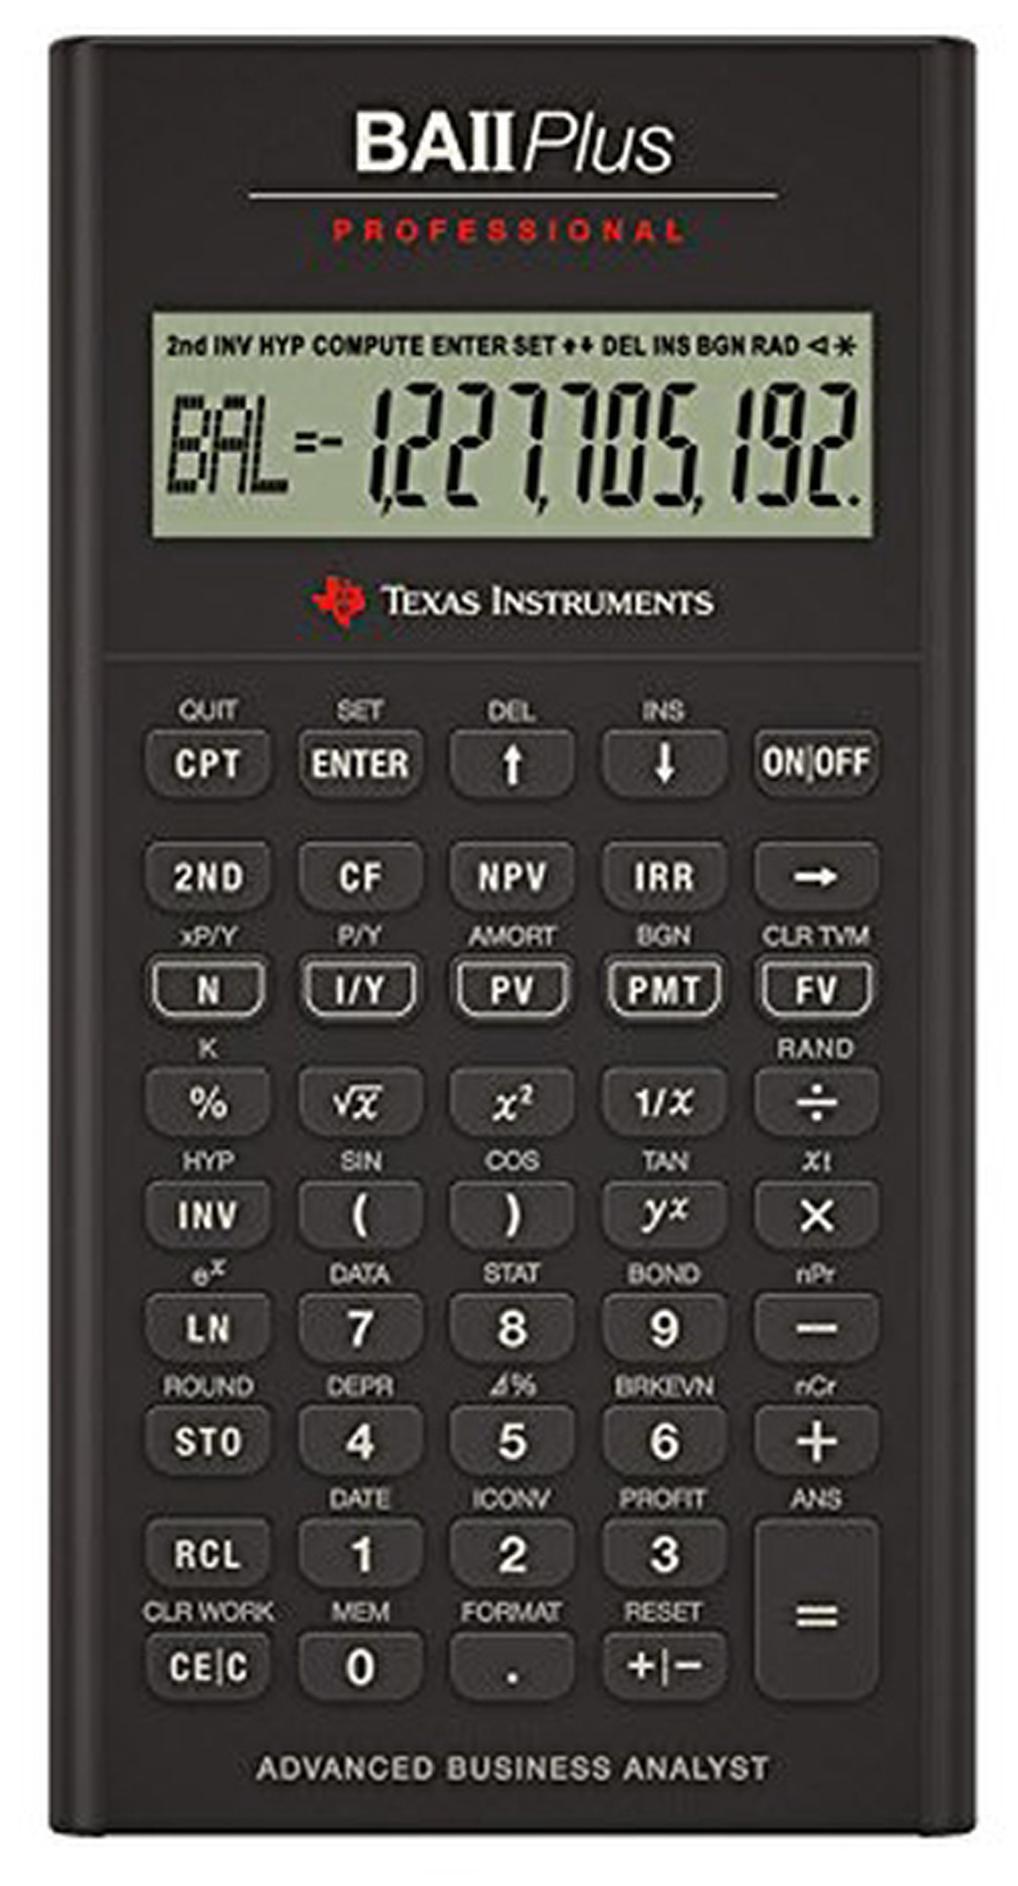 buy texas instruments ba ii professional financial calculator onlinetexas instruments ba ii professional financial calculator